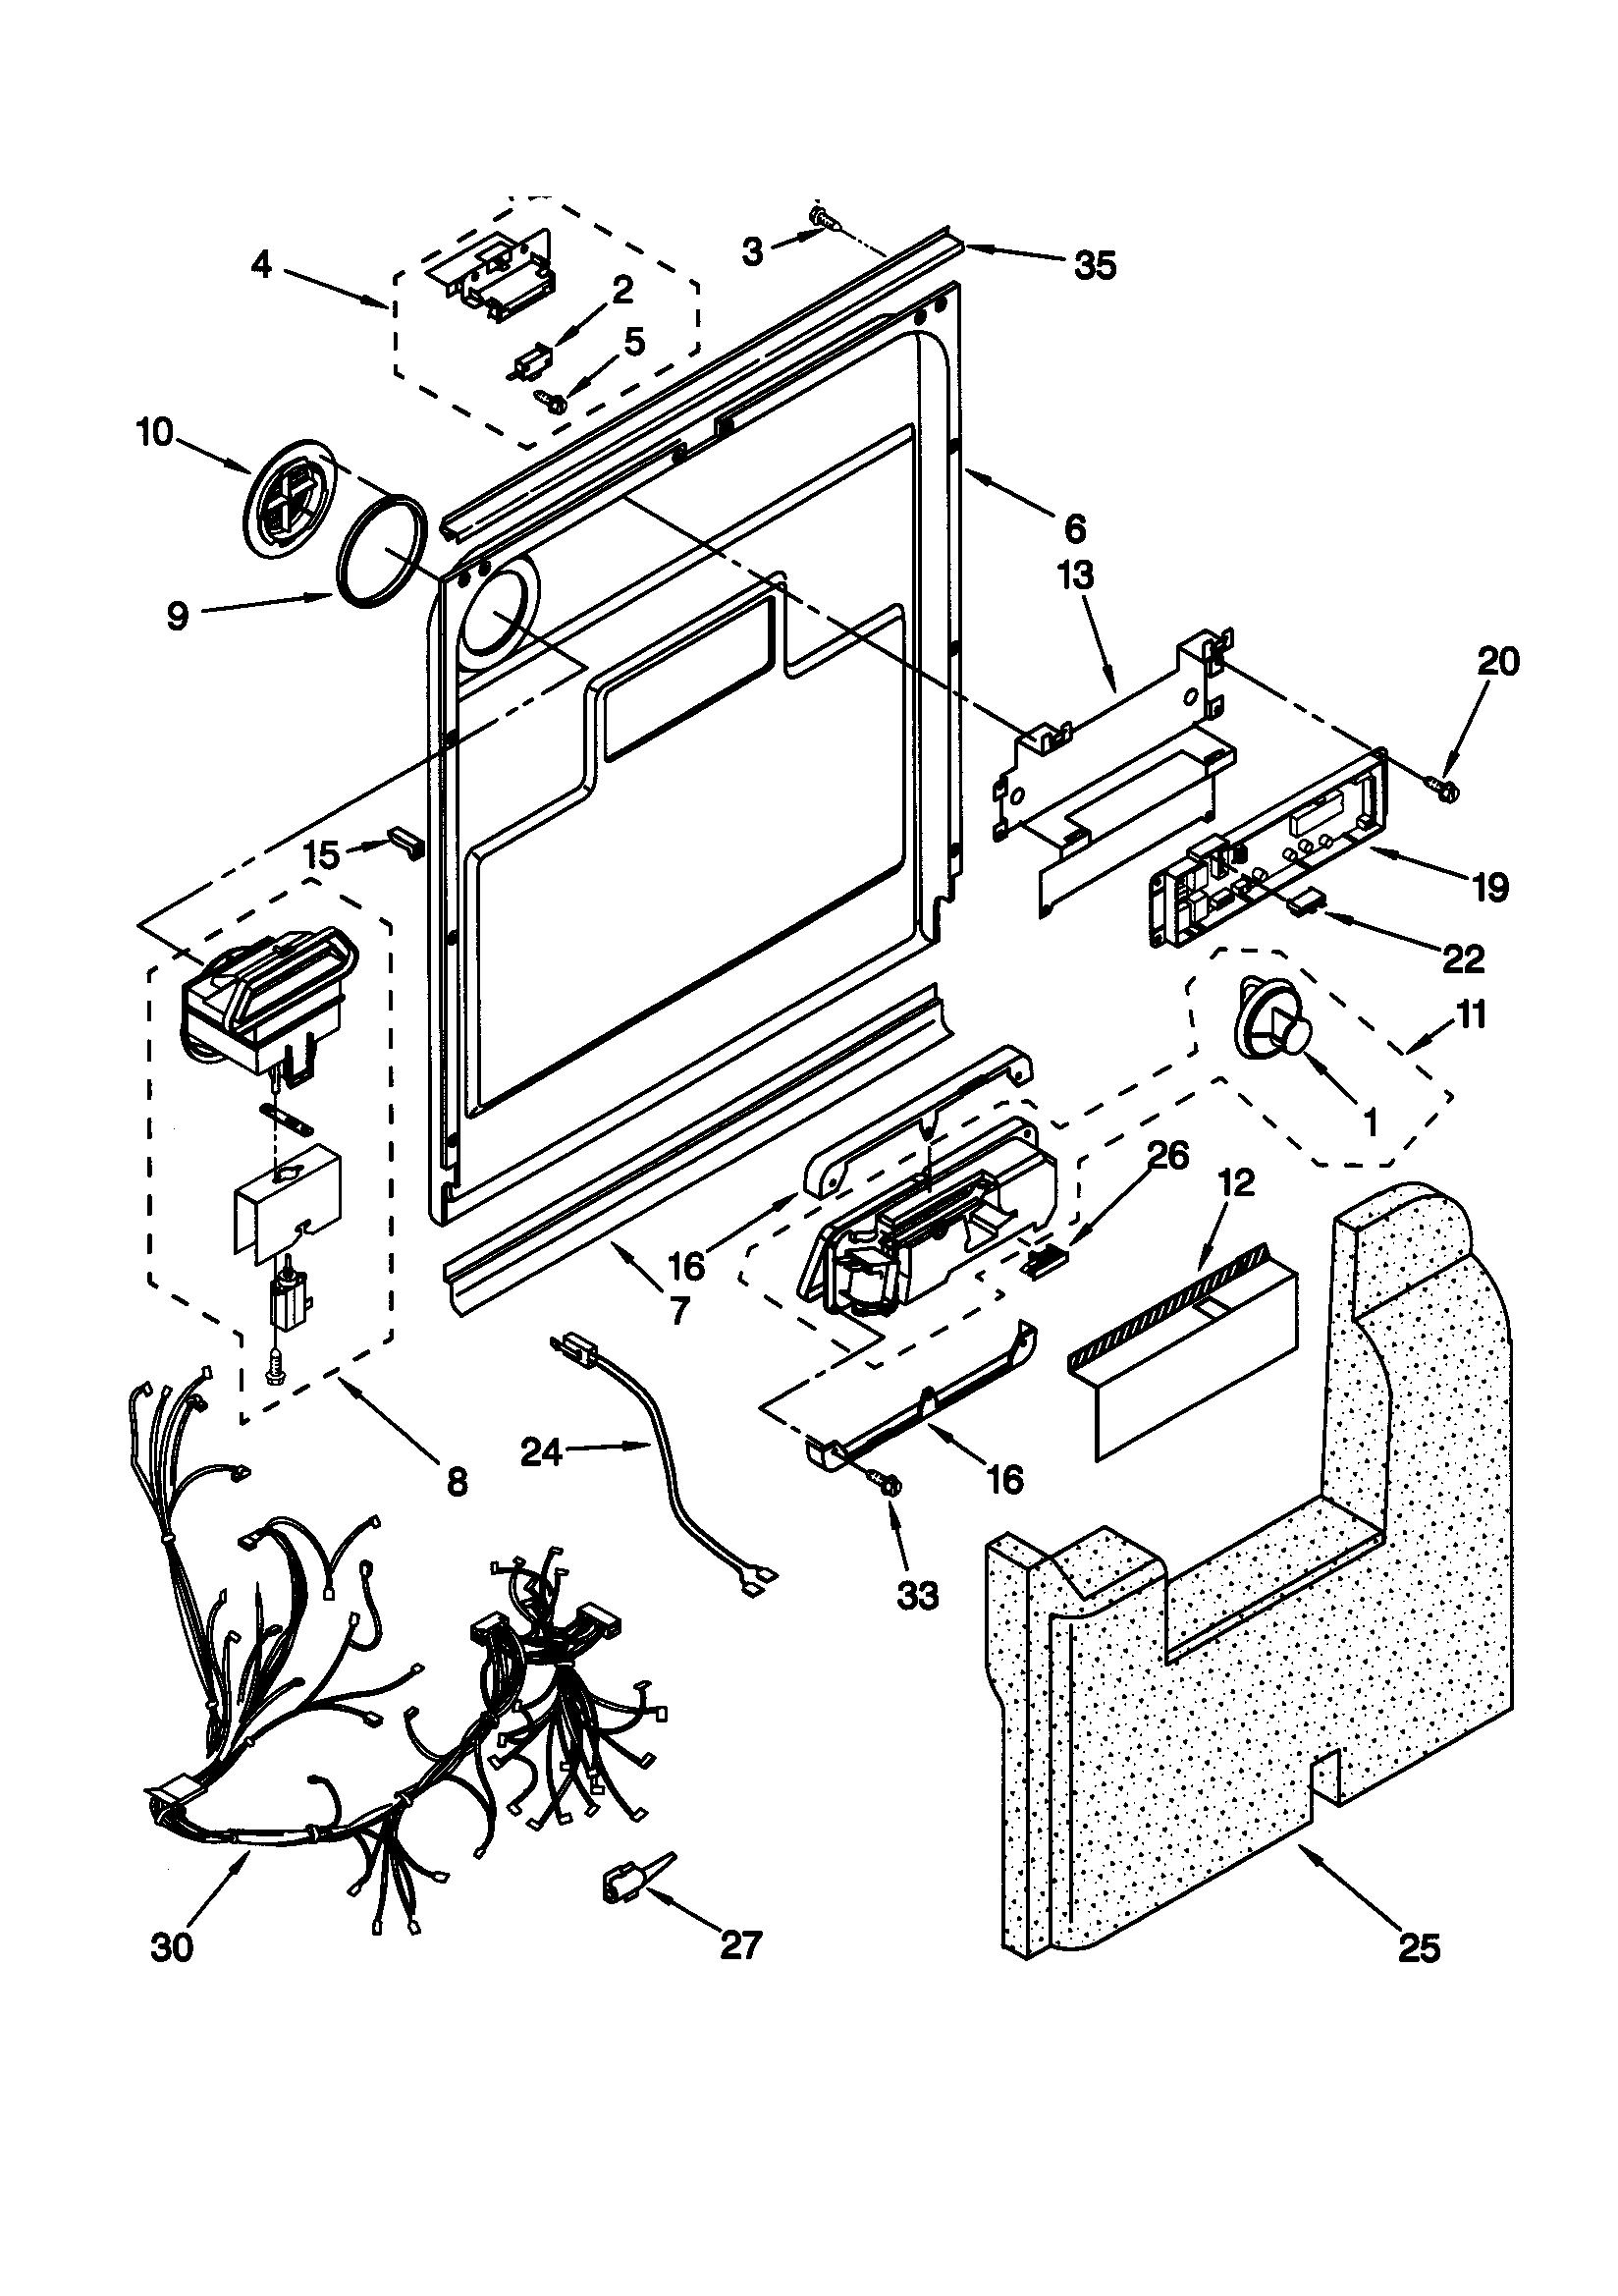 Kenmore Dishwasher Parts Diagram : kenmore, dishwasher, parts, diagram, Kenmore, 66515982990, Timer, Stove, Clocks, Appliance, Timers